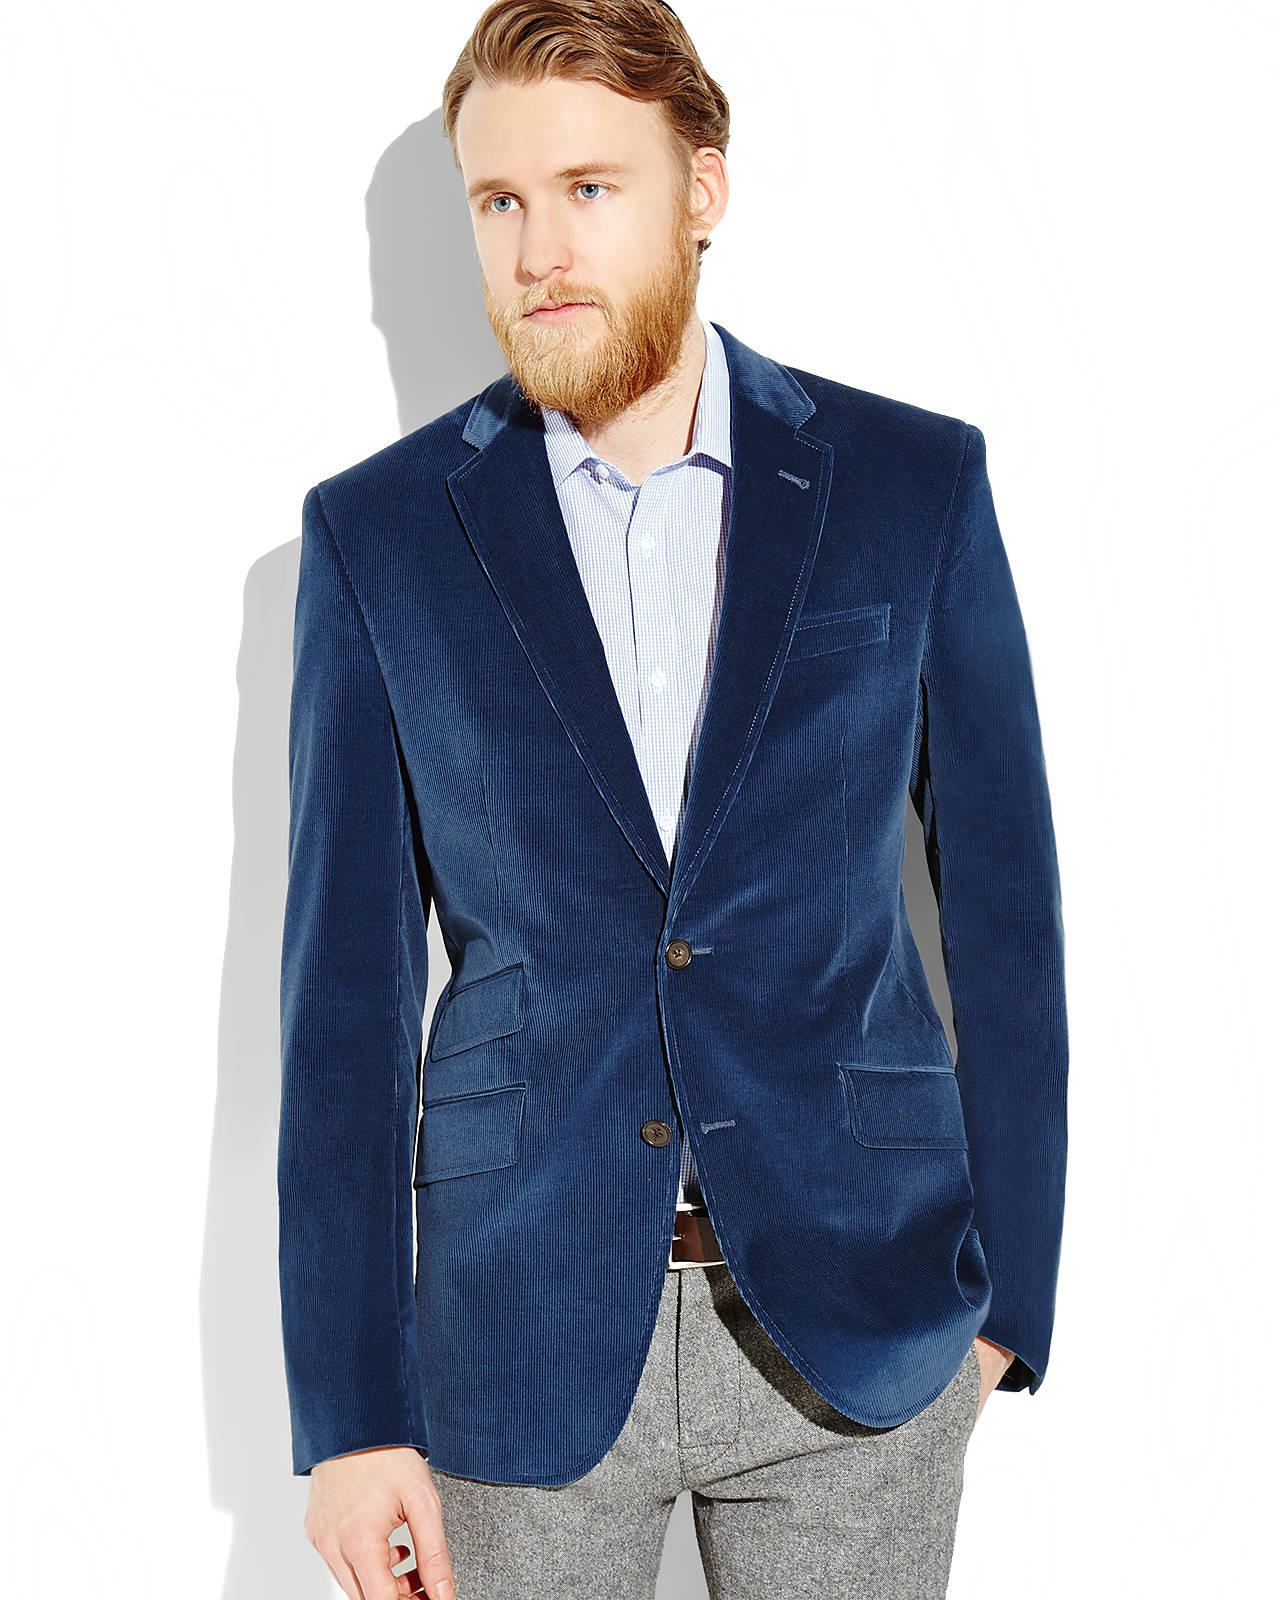 Ted baker Blue Corduroy Sport Coat in Blue for Men | Lyst